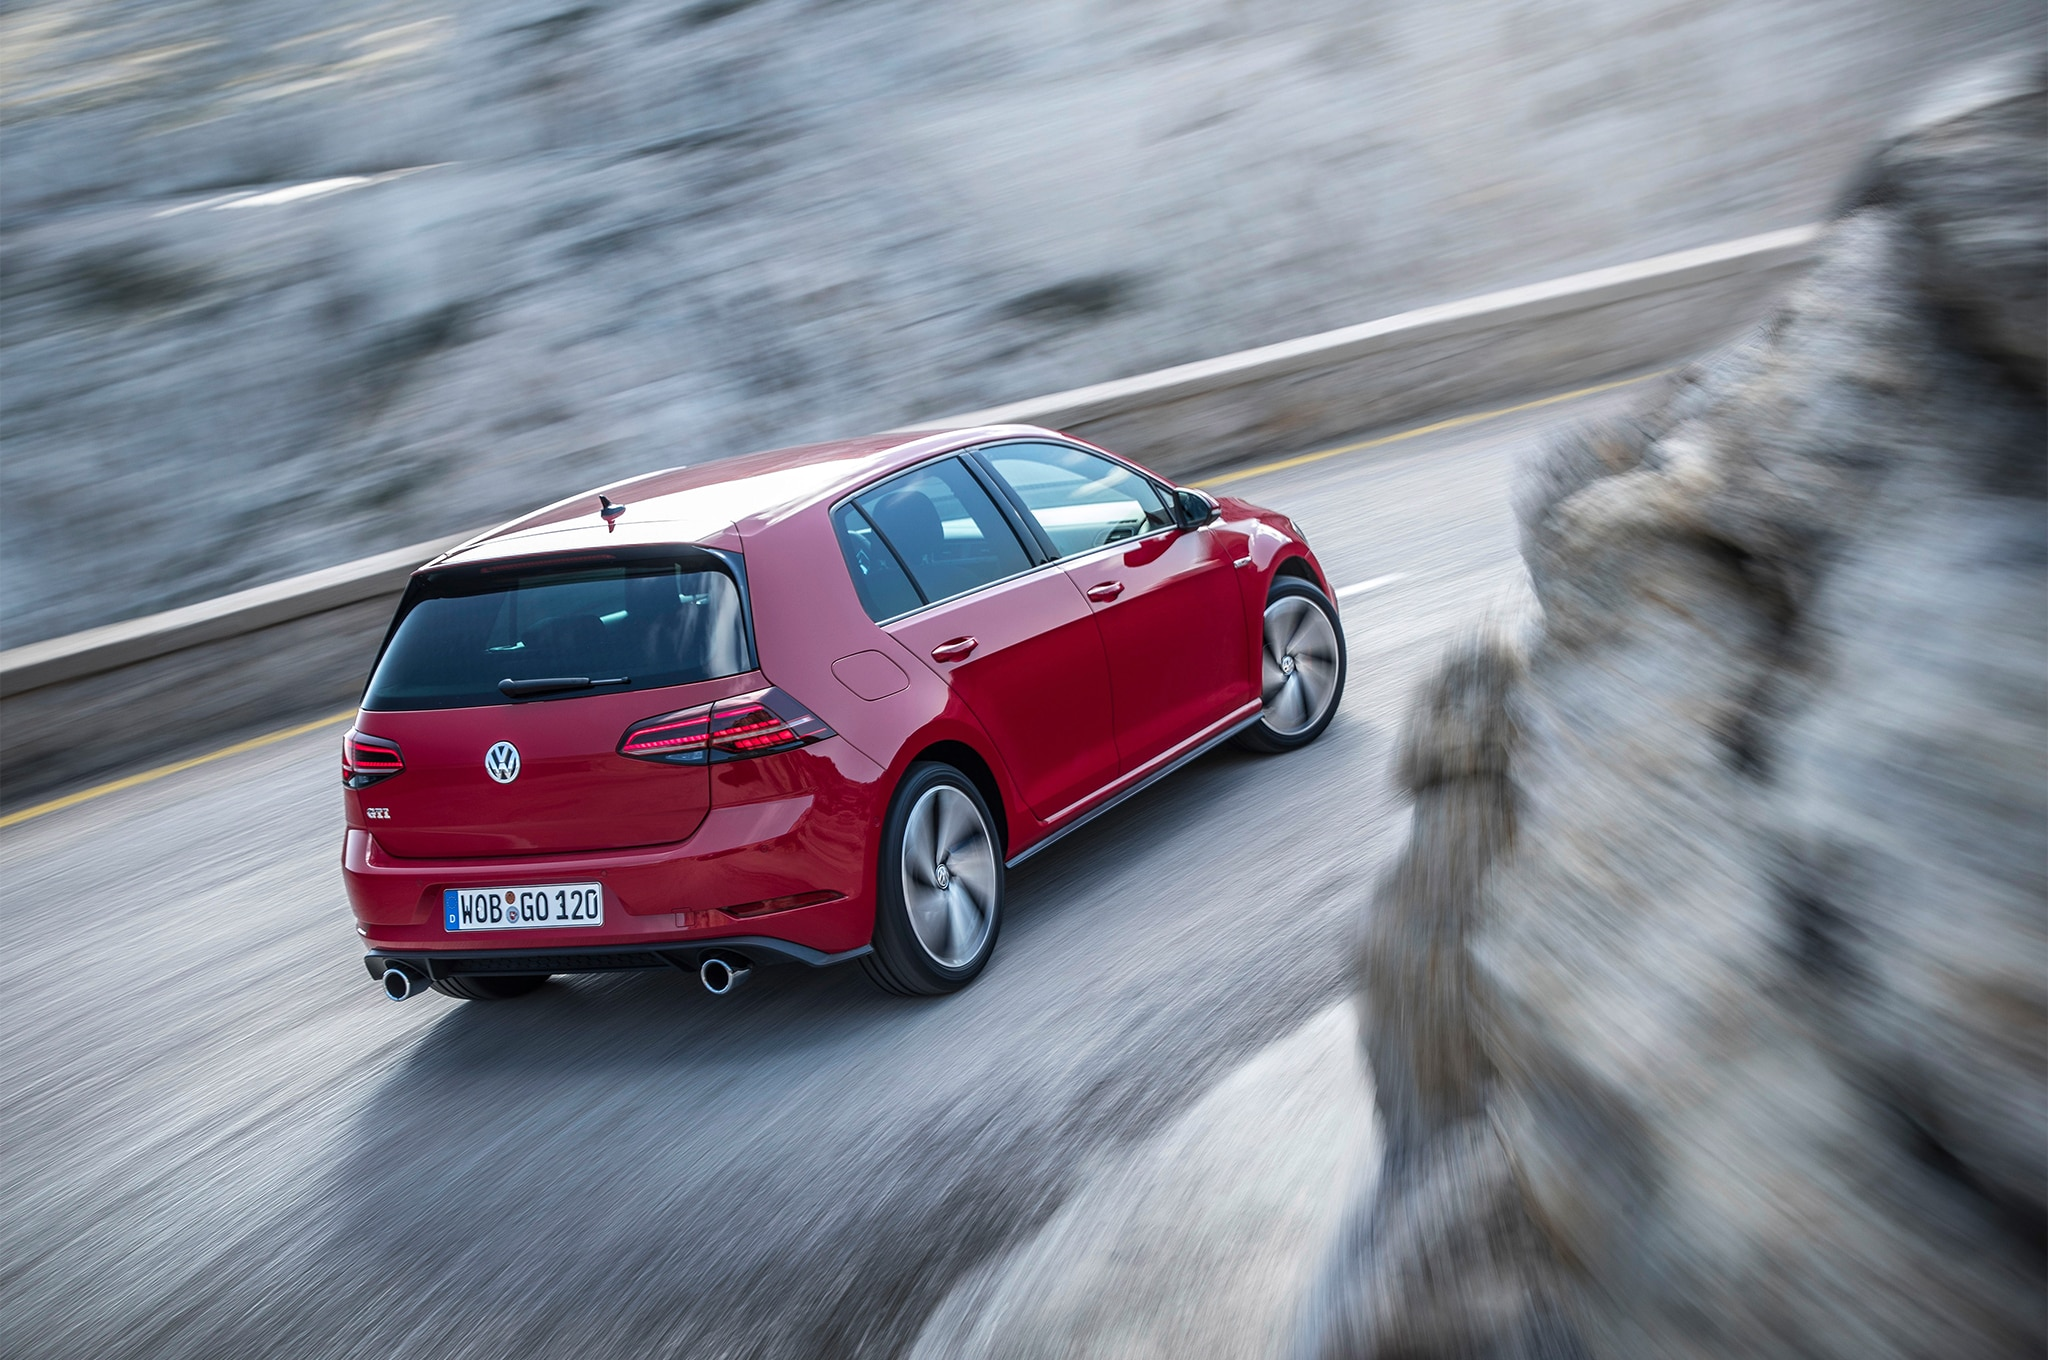 Vw Gti 0 60 >> 2018 Volkswagen Golf GTI European Spec | Automobile Magazine